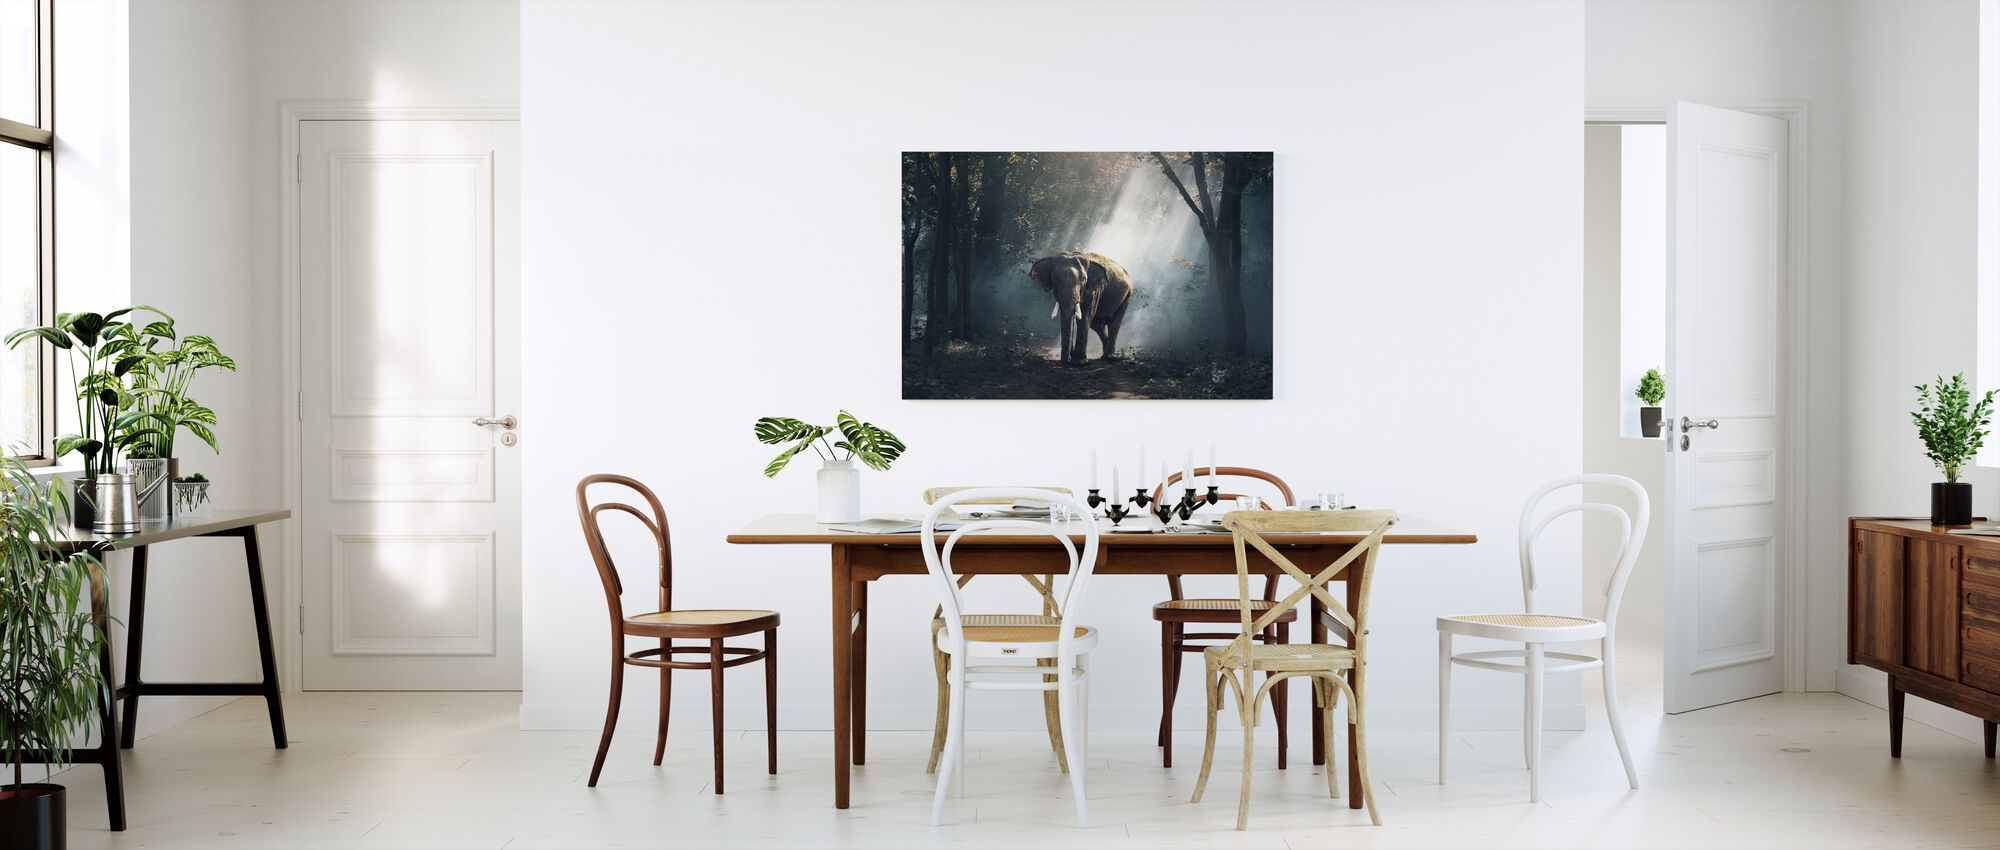 Olifant in het bos - Canvas print - Keuken